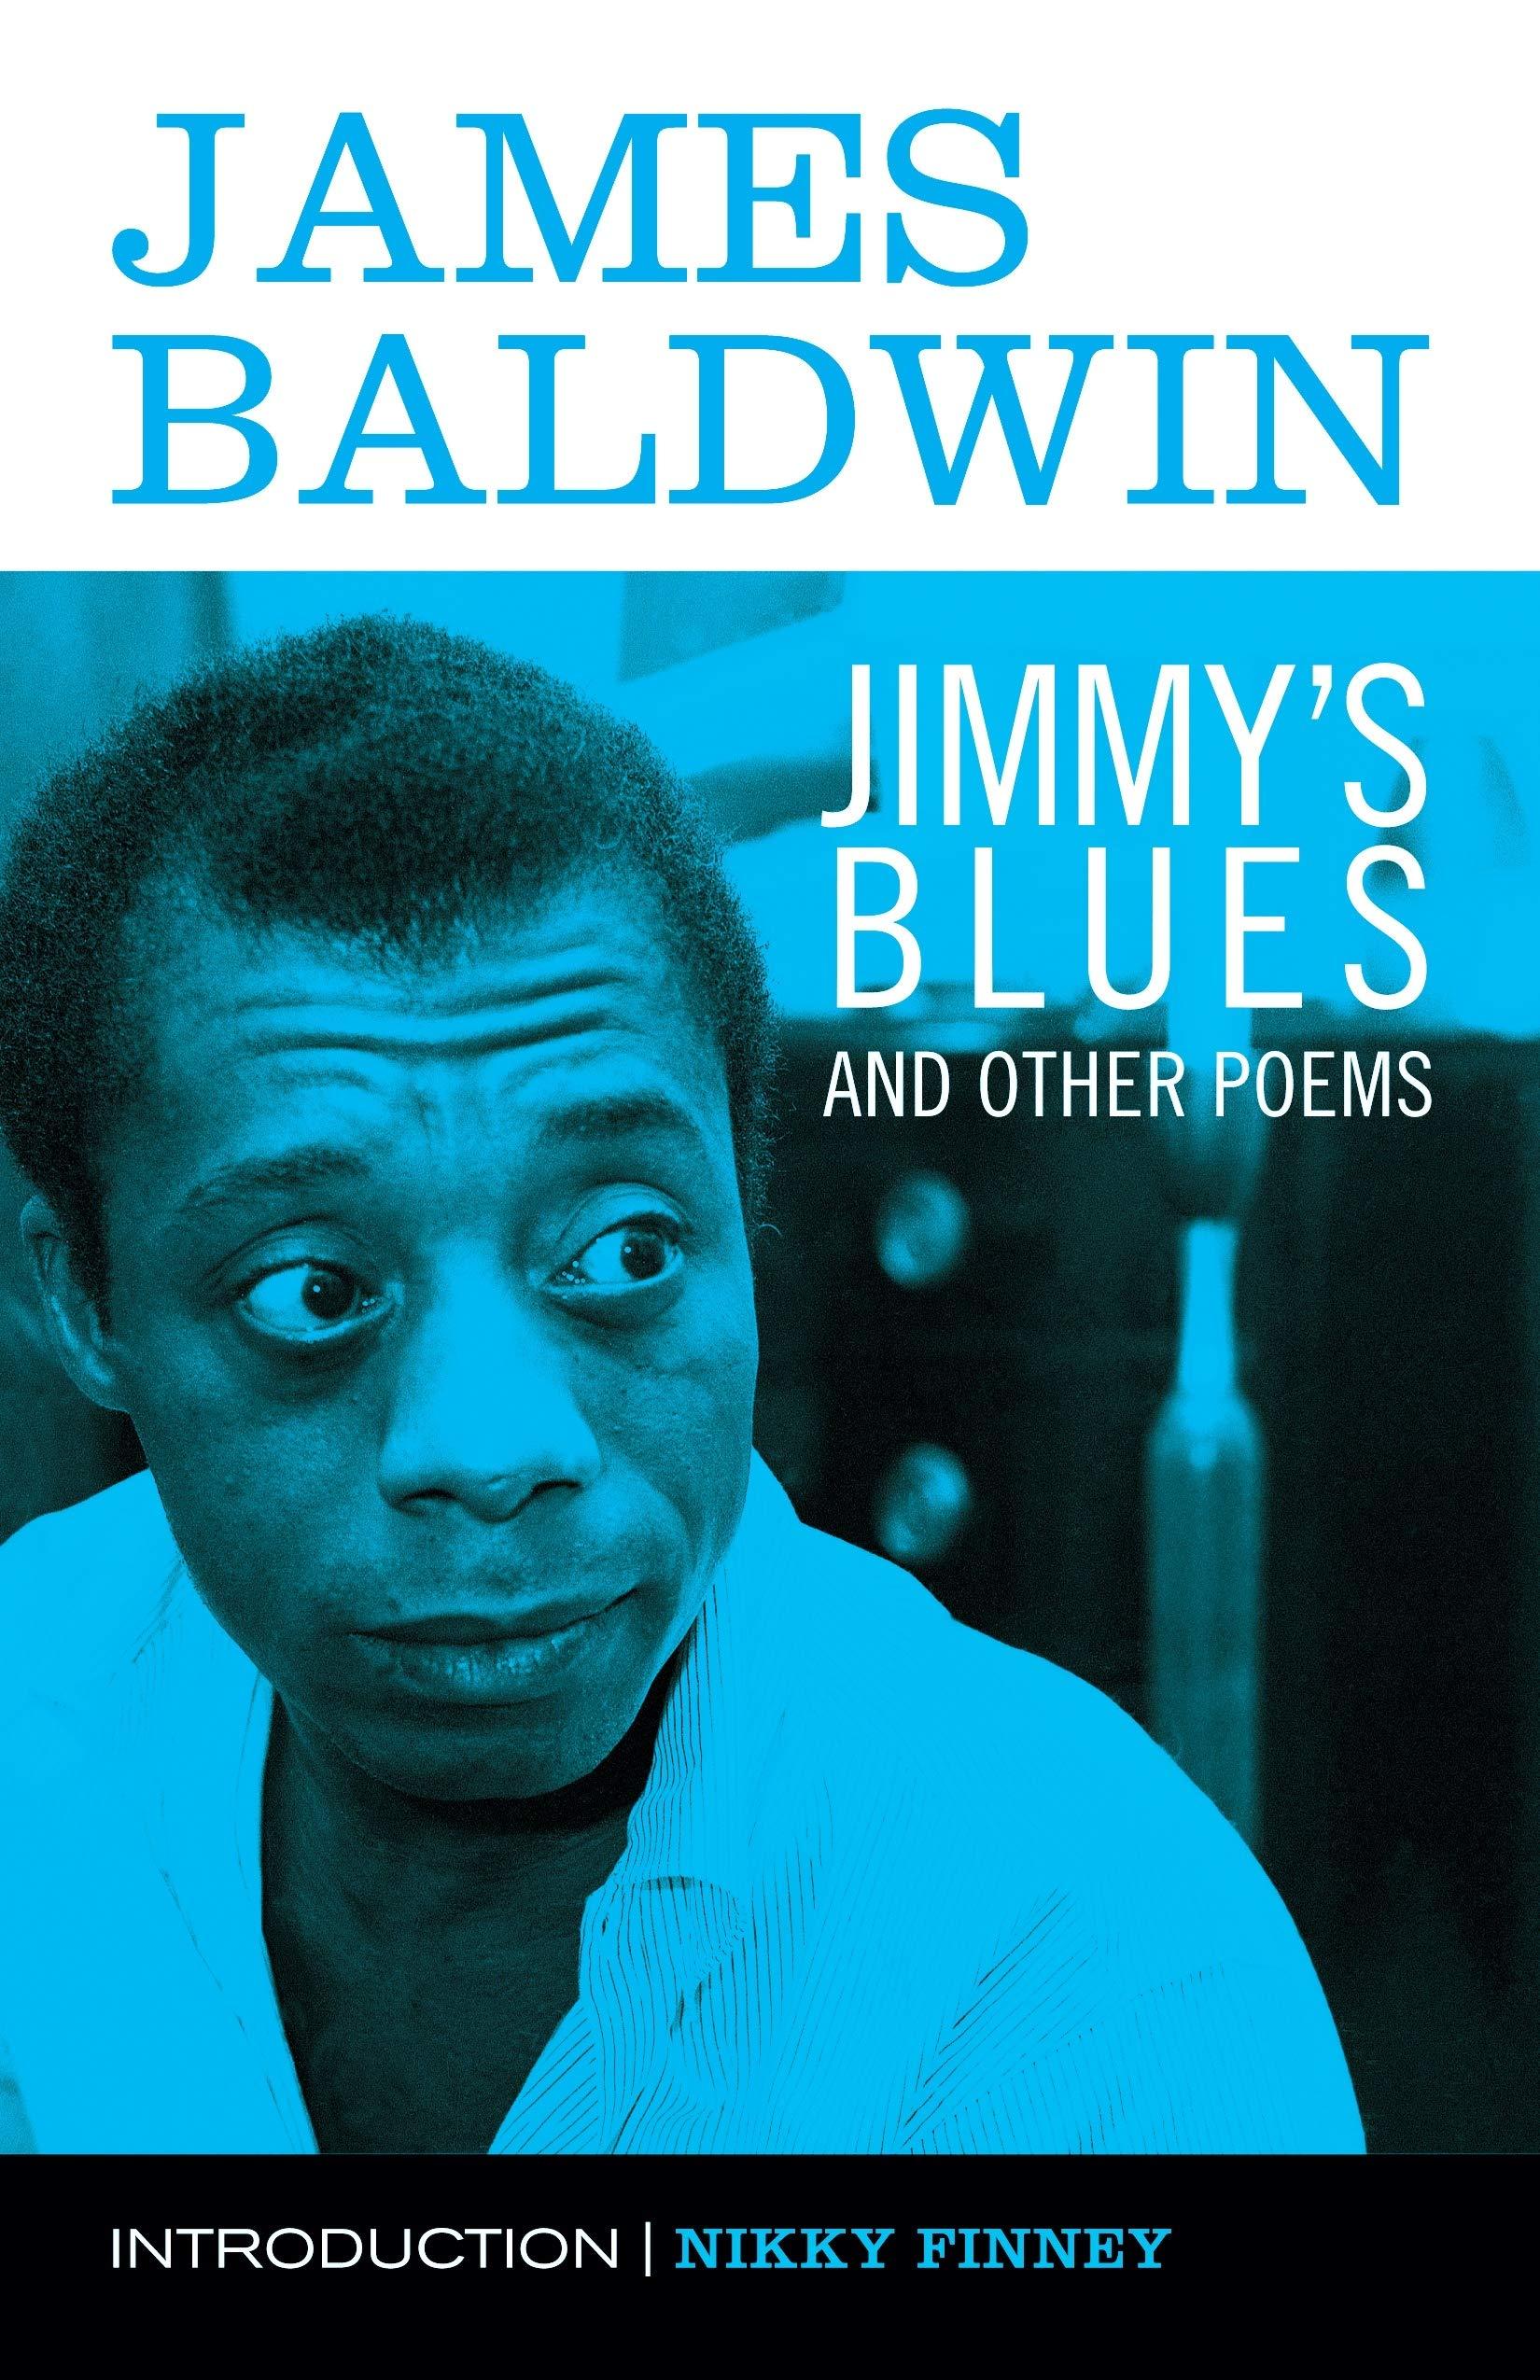 James Baldwin Poems 2